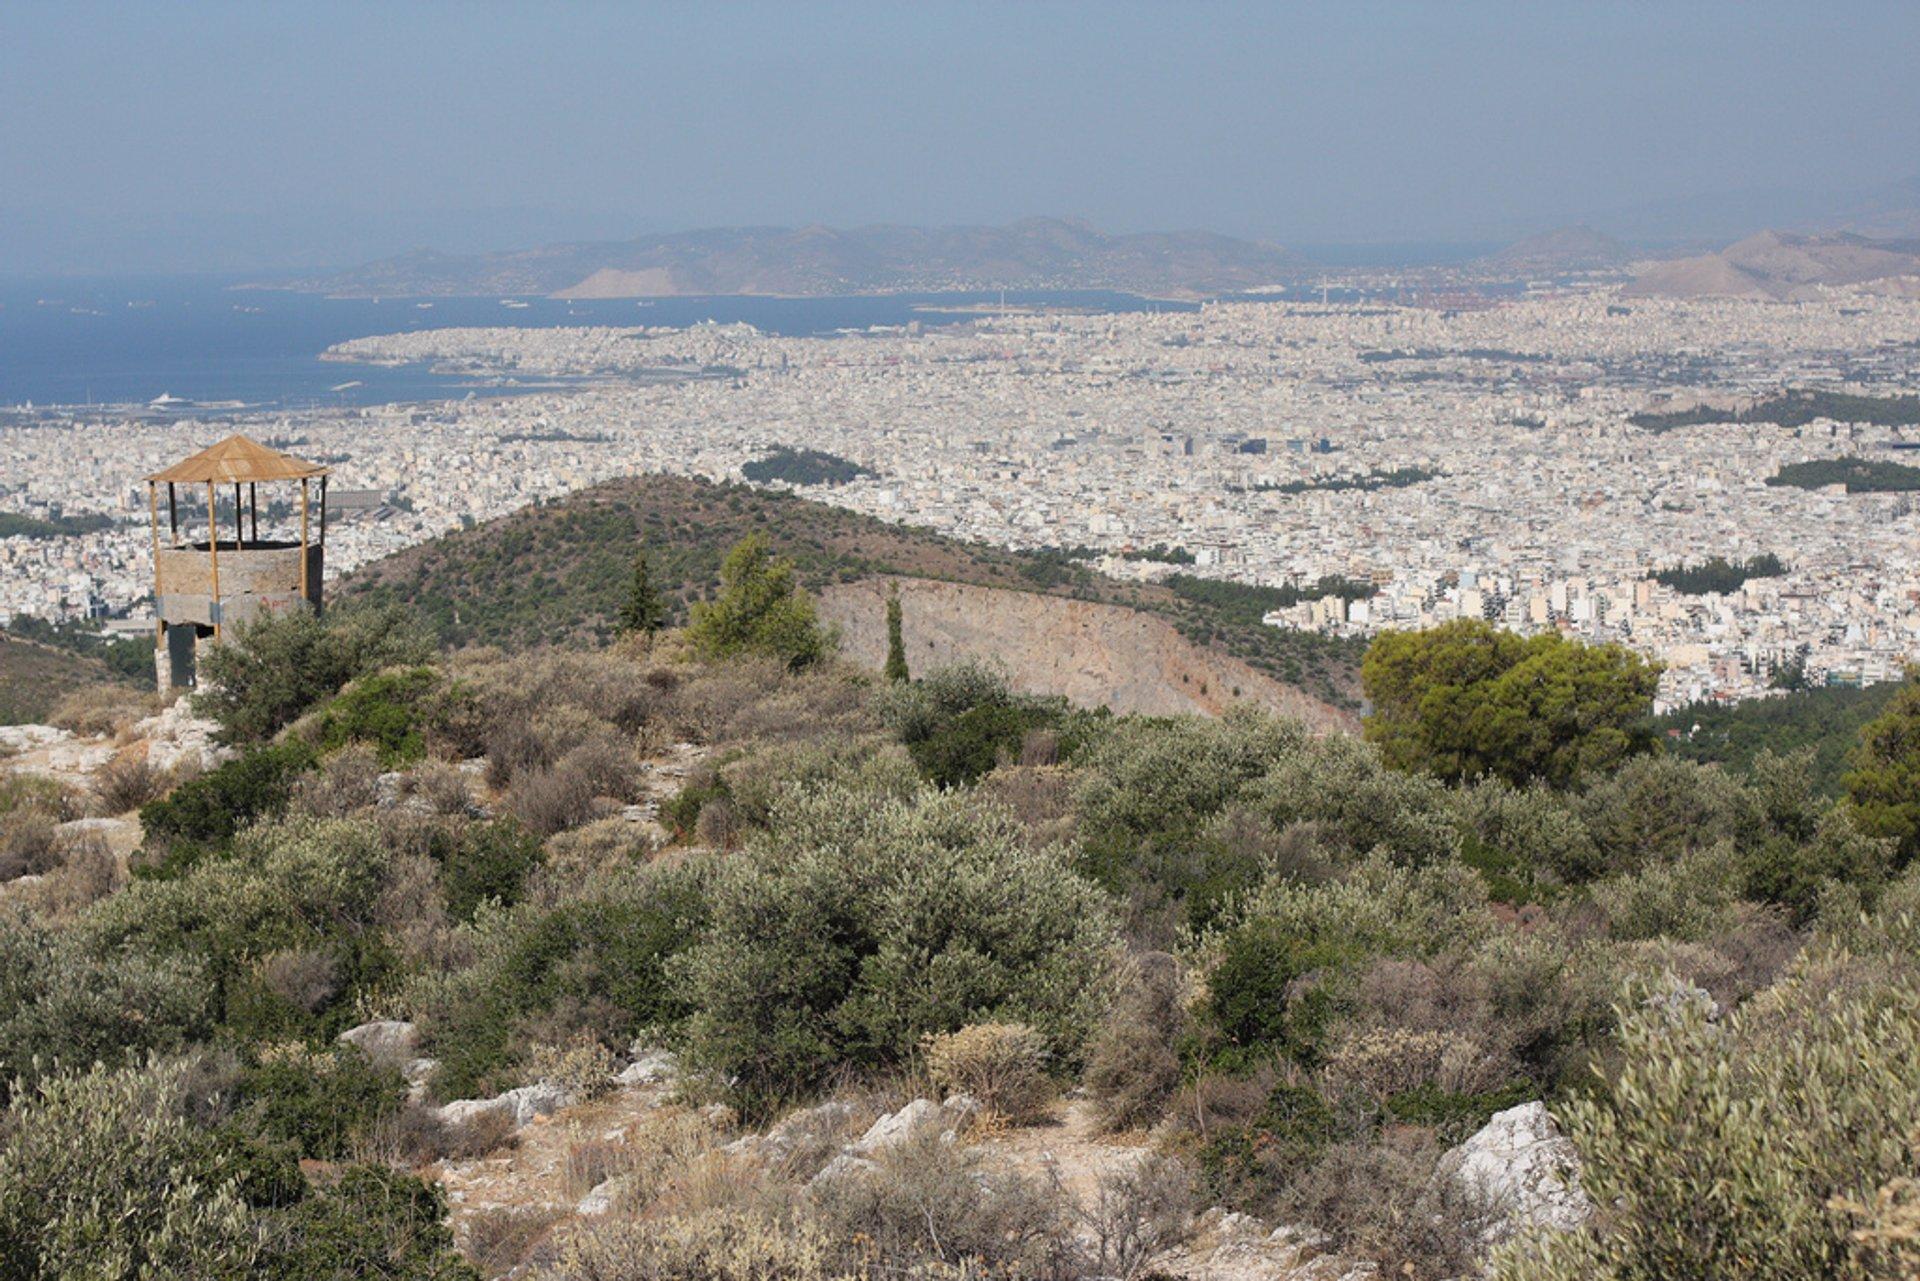 Hymettus, Athens, Greece 2019